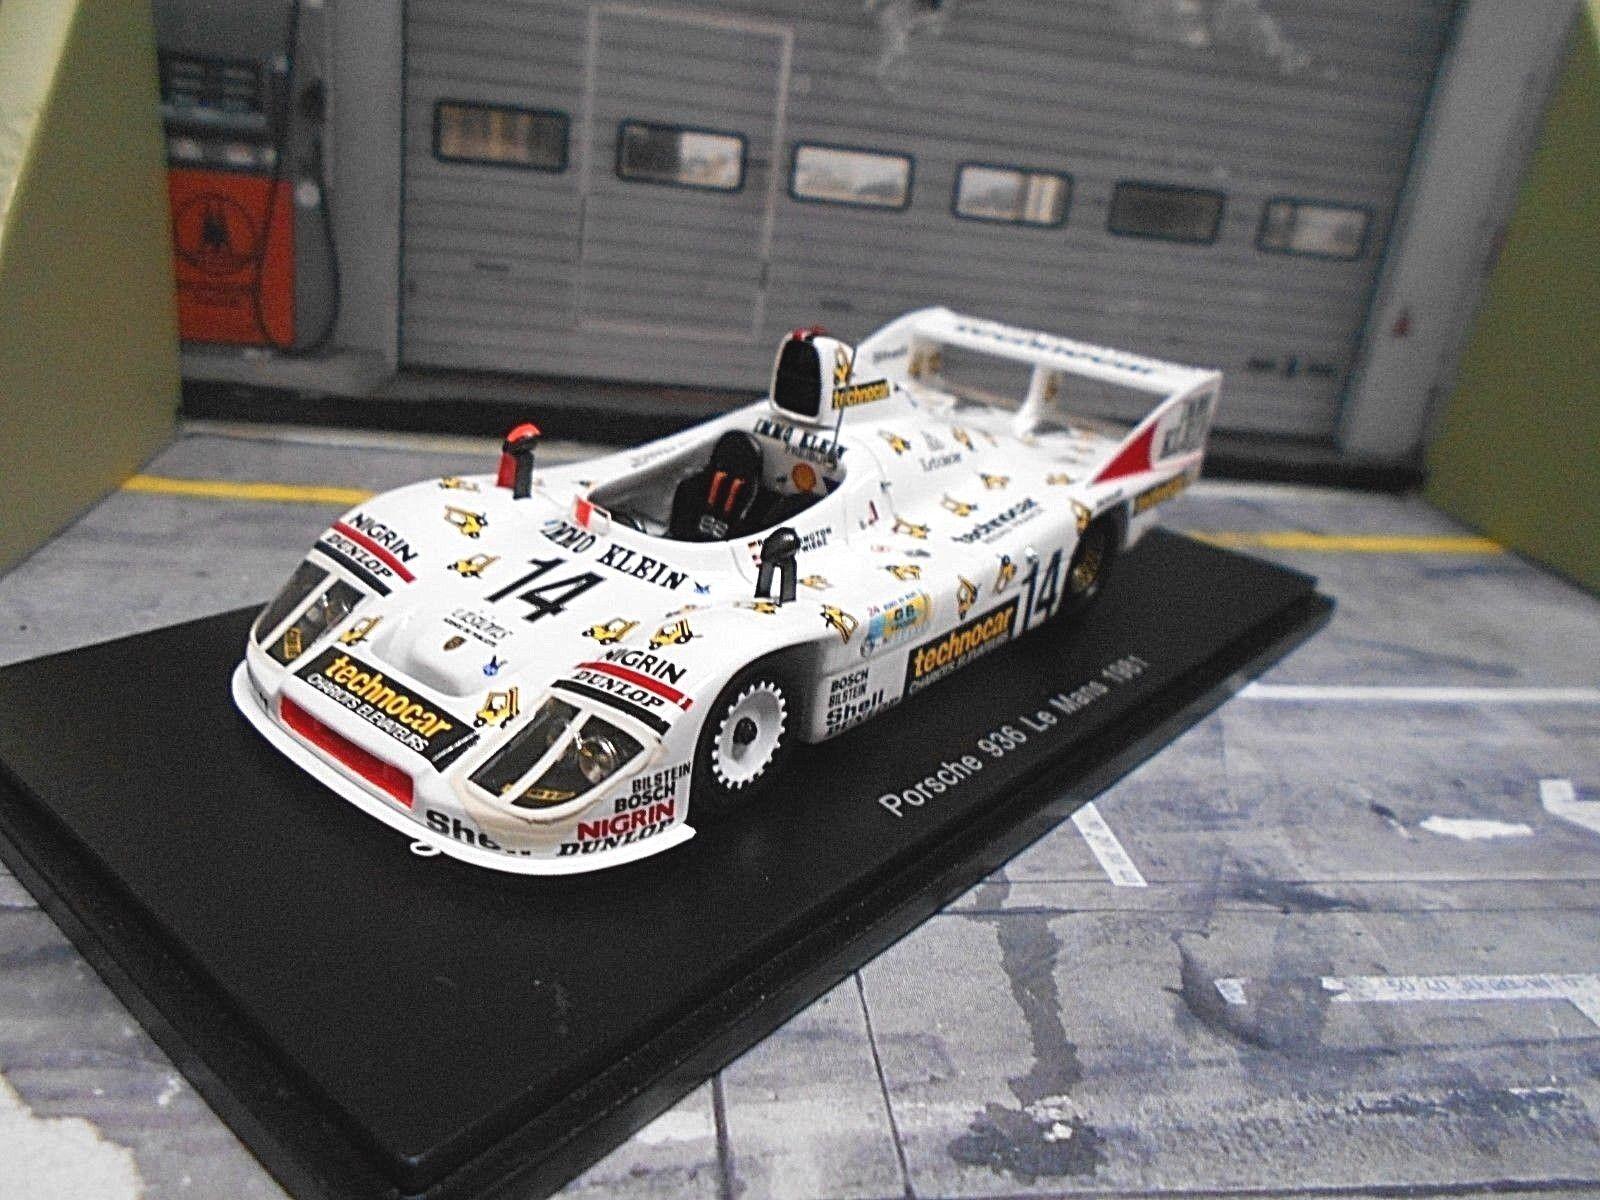 PORSCHE 908 908 80 936 JOEST Le Mans  14 Niedzwiedz immo piccoli tecnica Spark 1 43